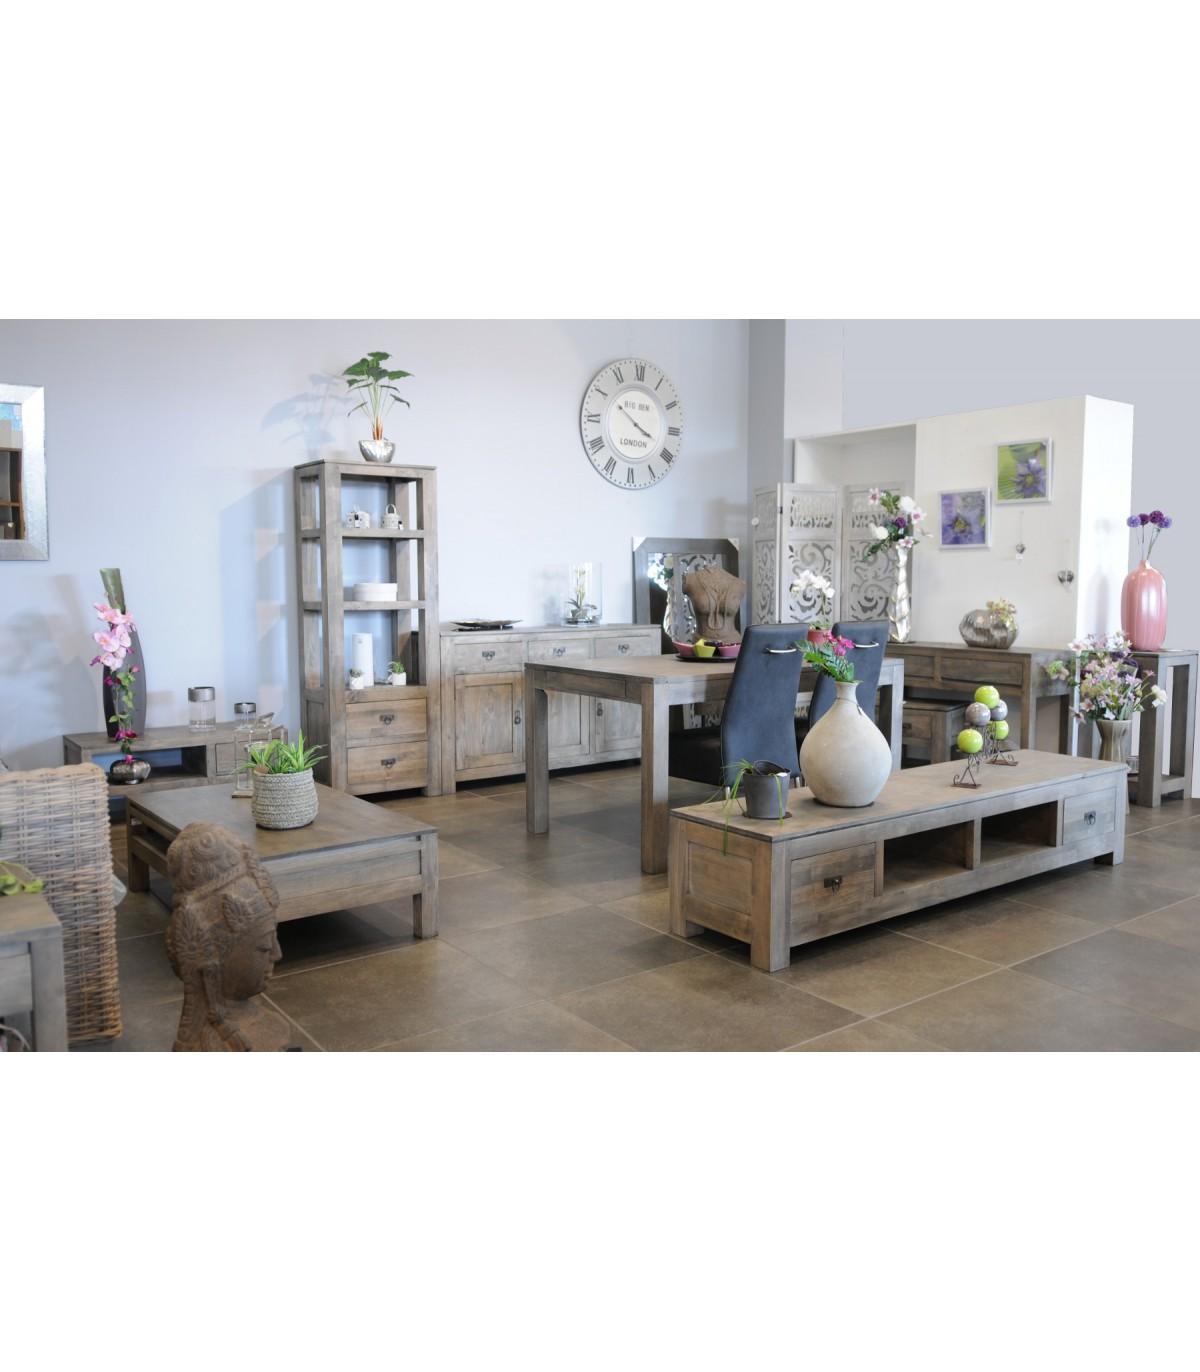 Grand meuble tv hevea teck bois gris meubles exotiques meubles hevea - Magasin meuble bois exotique ...